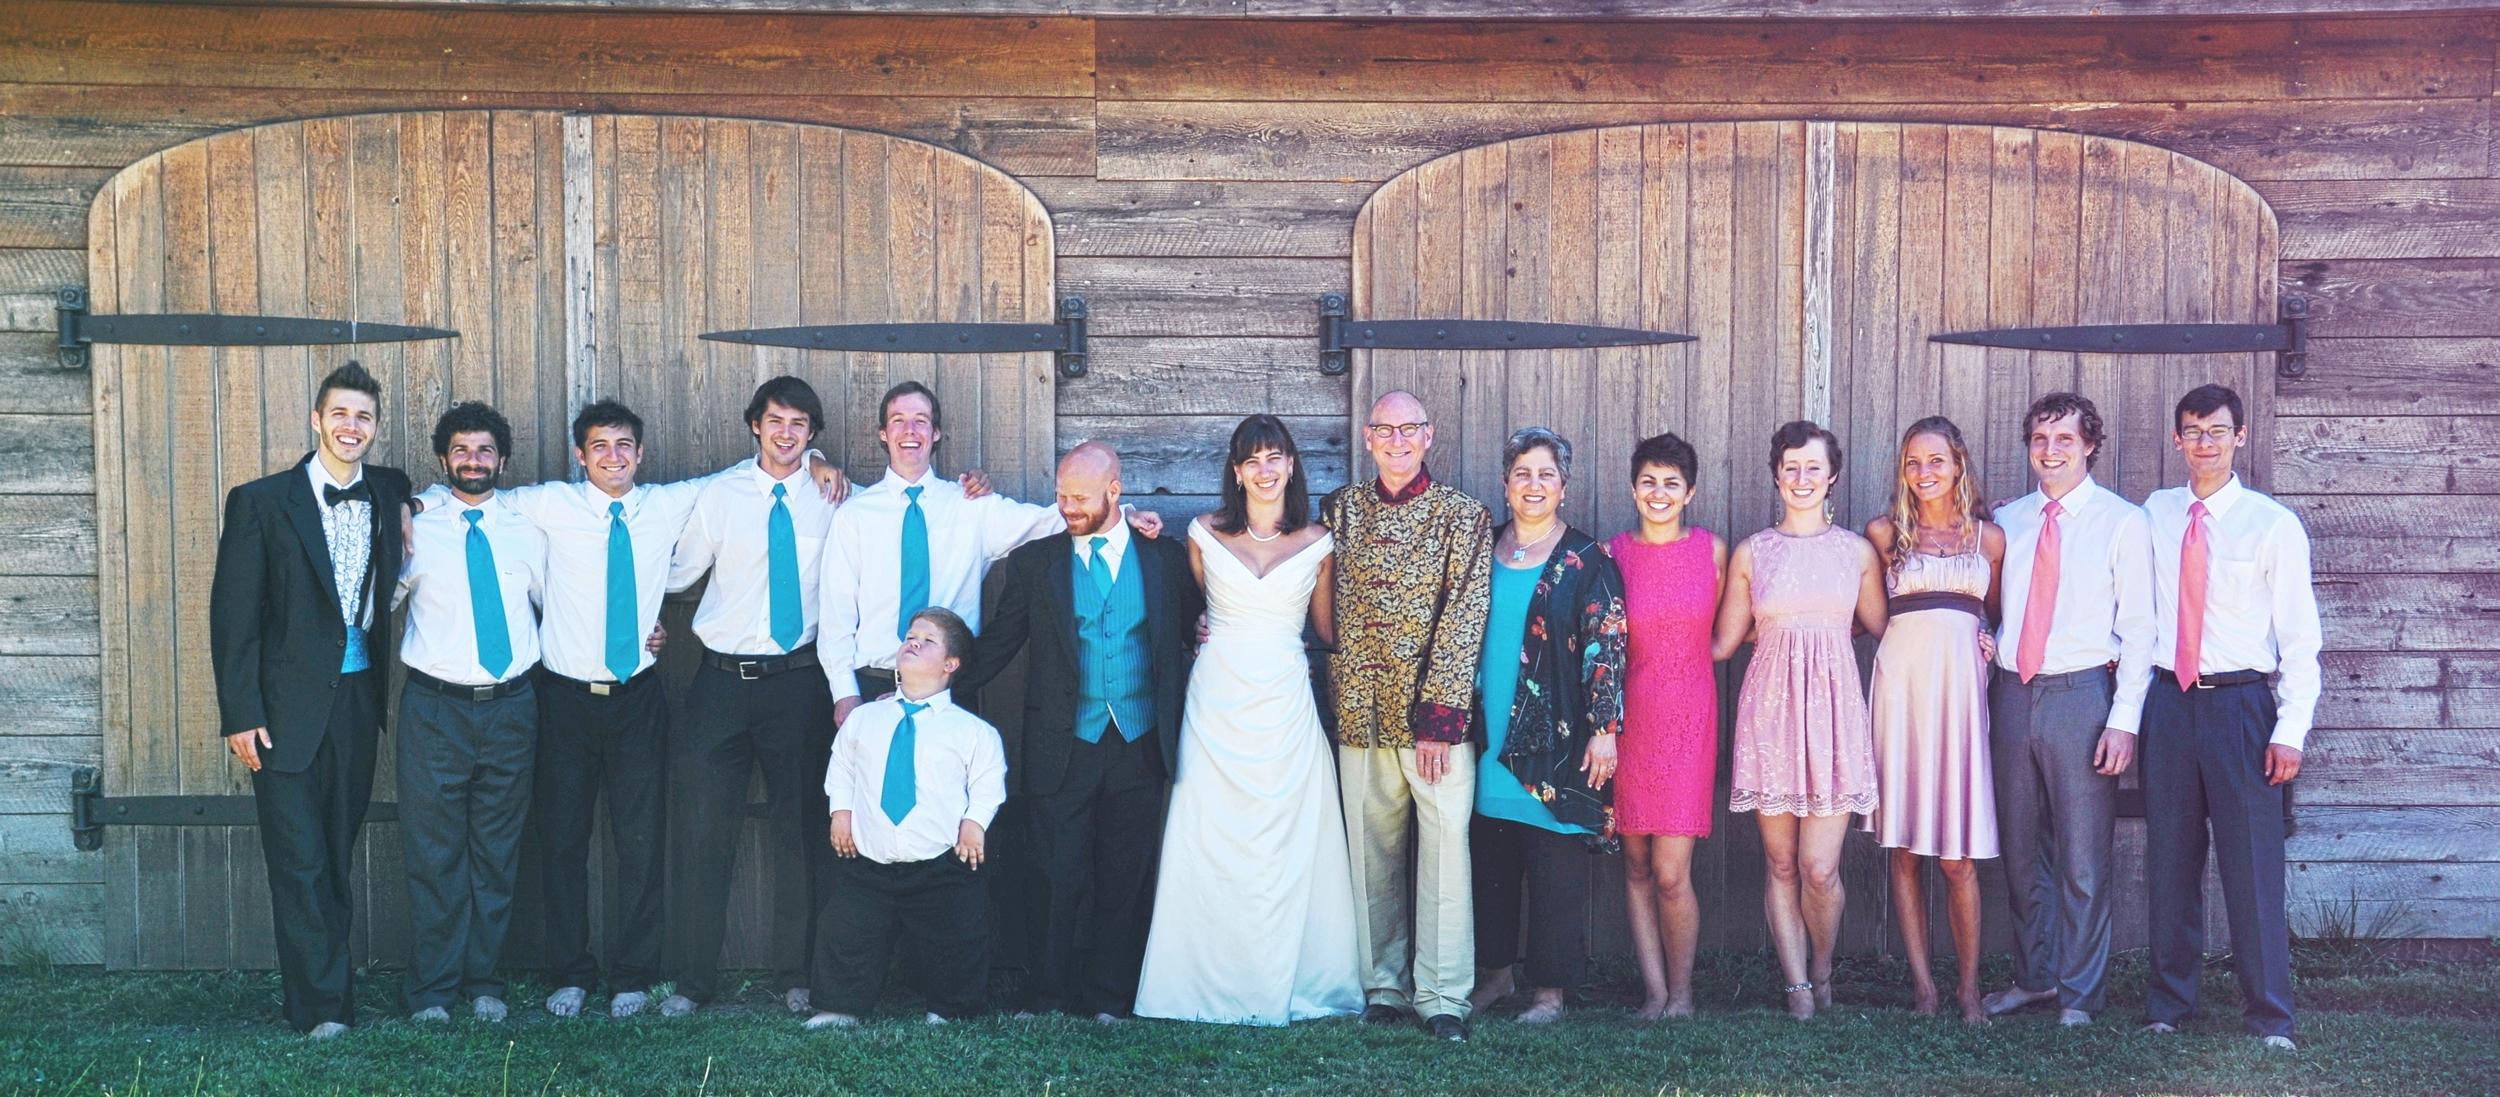 34.-Weddings-Group-Family-Photo_Carly-Carpenter.jpg